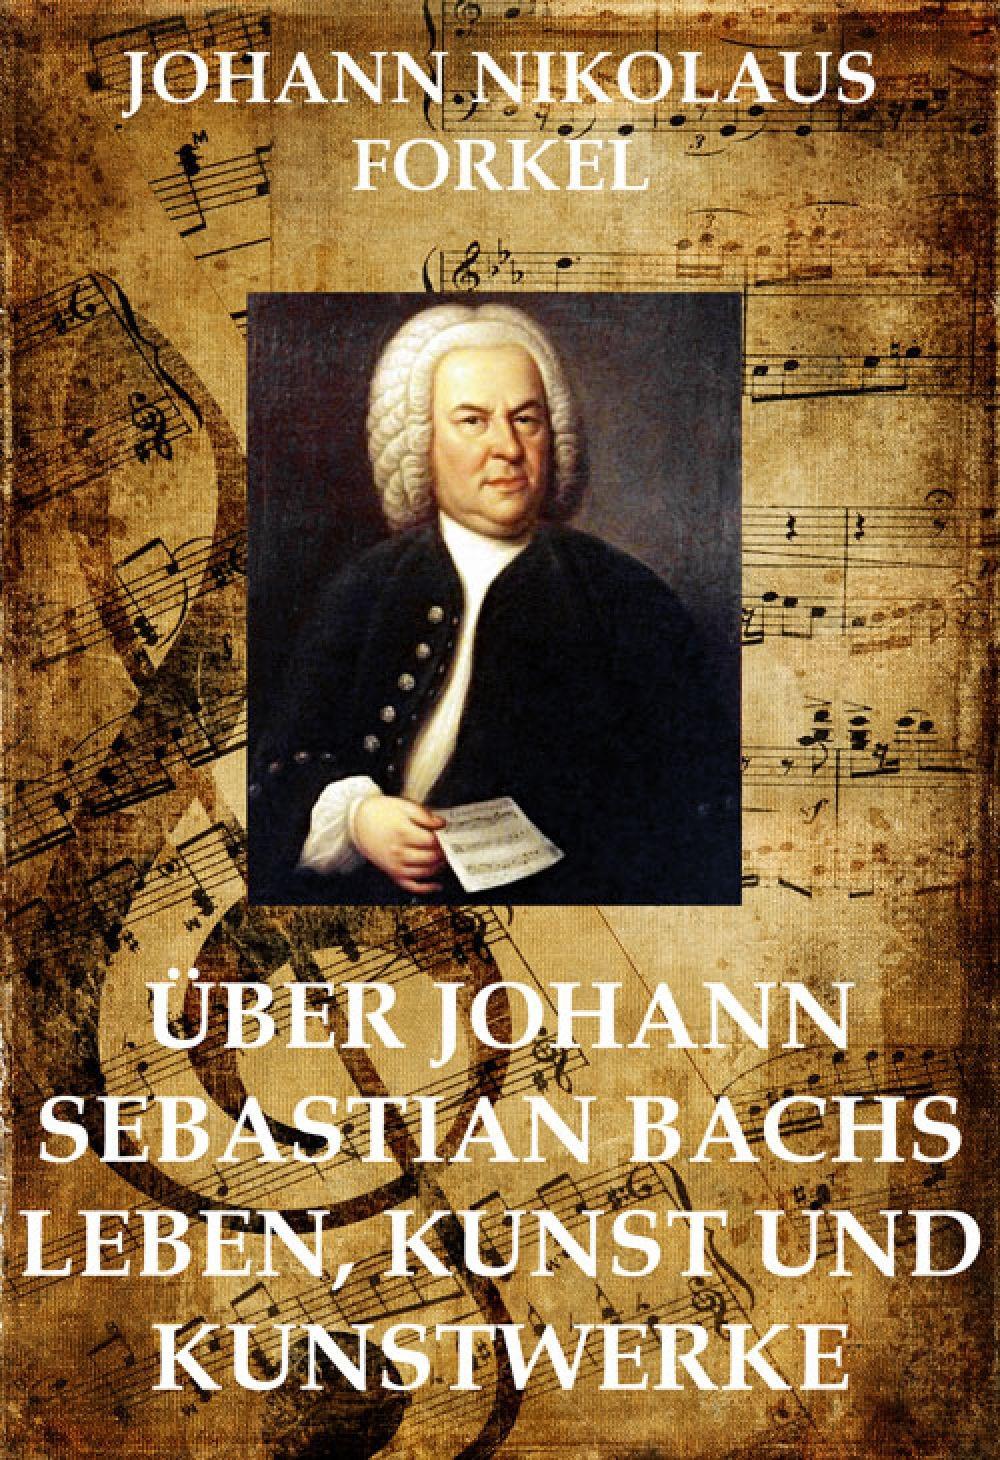 Johann Nikolaus Forkel Über Johann Sebastian Bachs Leben johann repomuk sepp das leben christi volumes 4 5 german edition